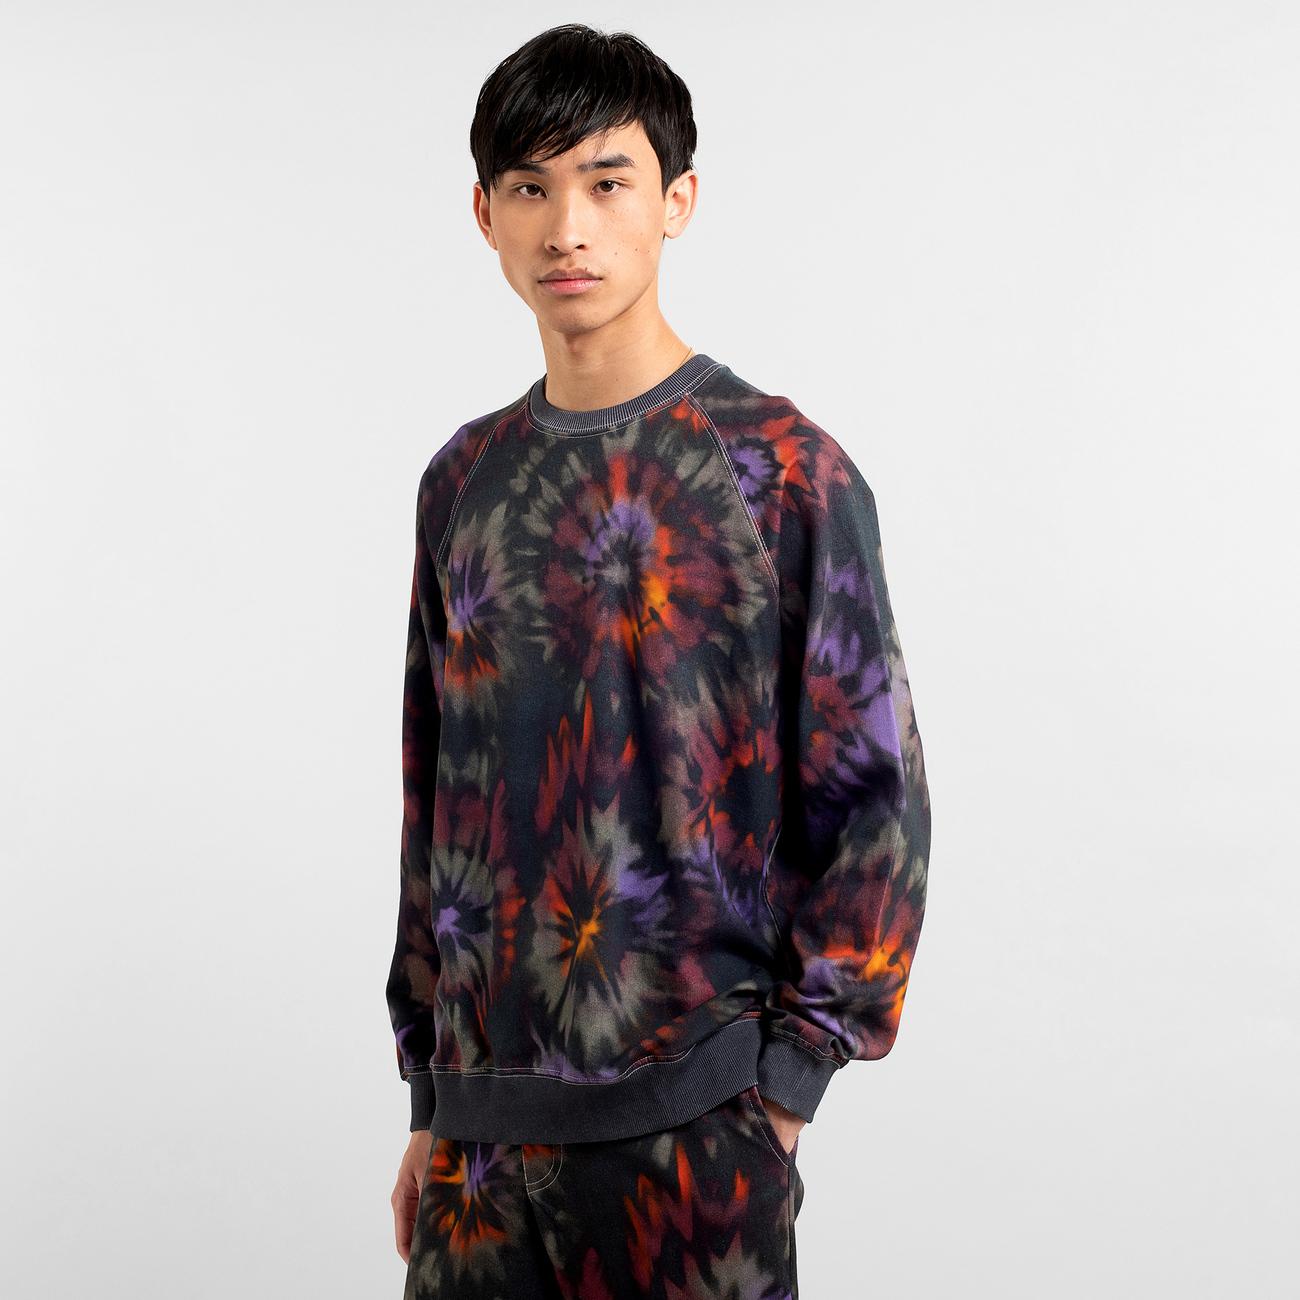 Sweatshirt Malmoe Tie Dye